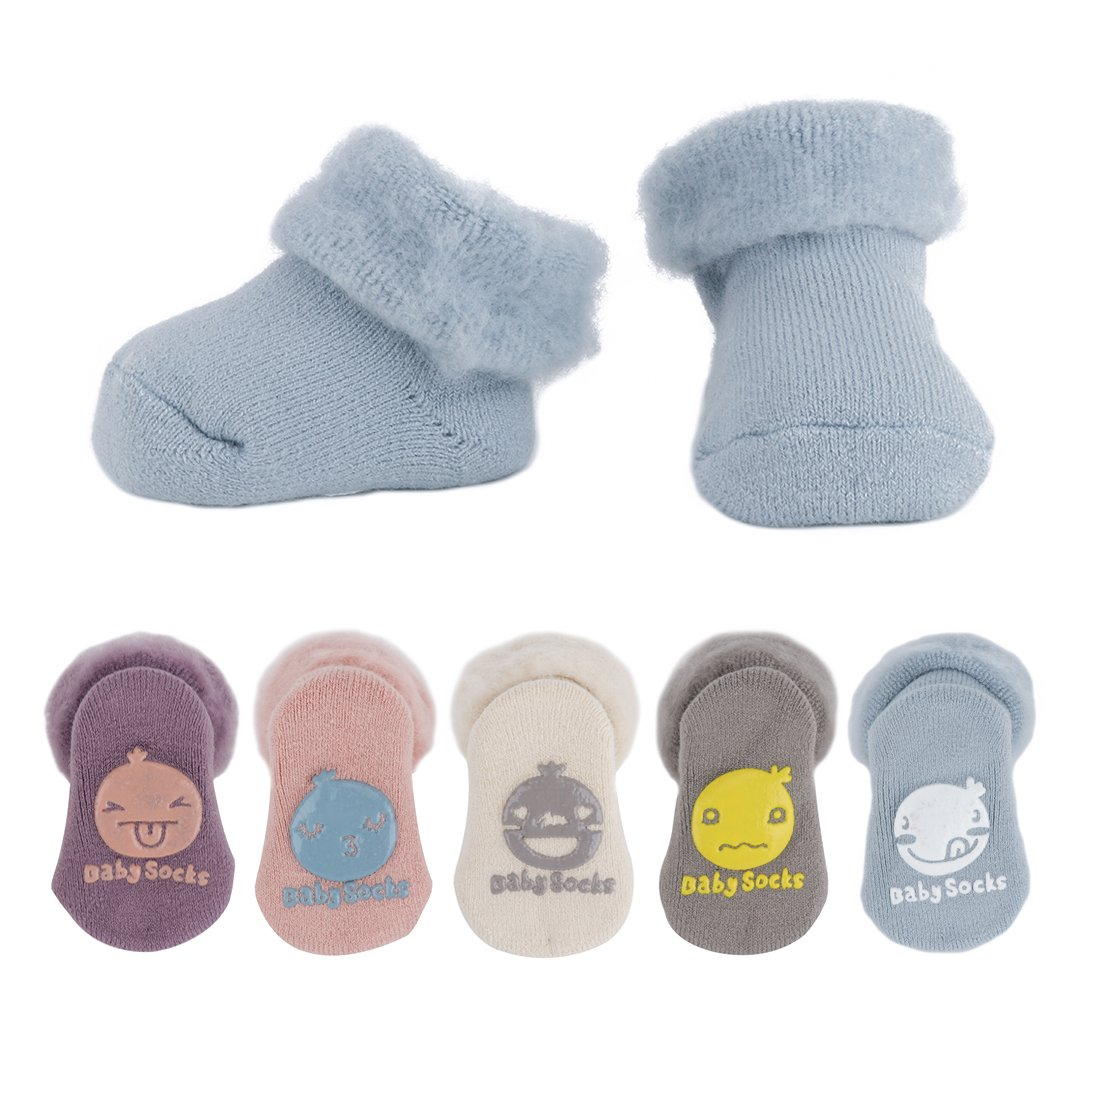 Ehdching 5 Pack Newborn Unisex Baby Toddler Boy Girl Organic Thick Cotton Turn Cuff Slipper Socks (M(12-36 Months))